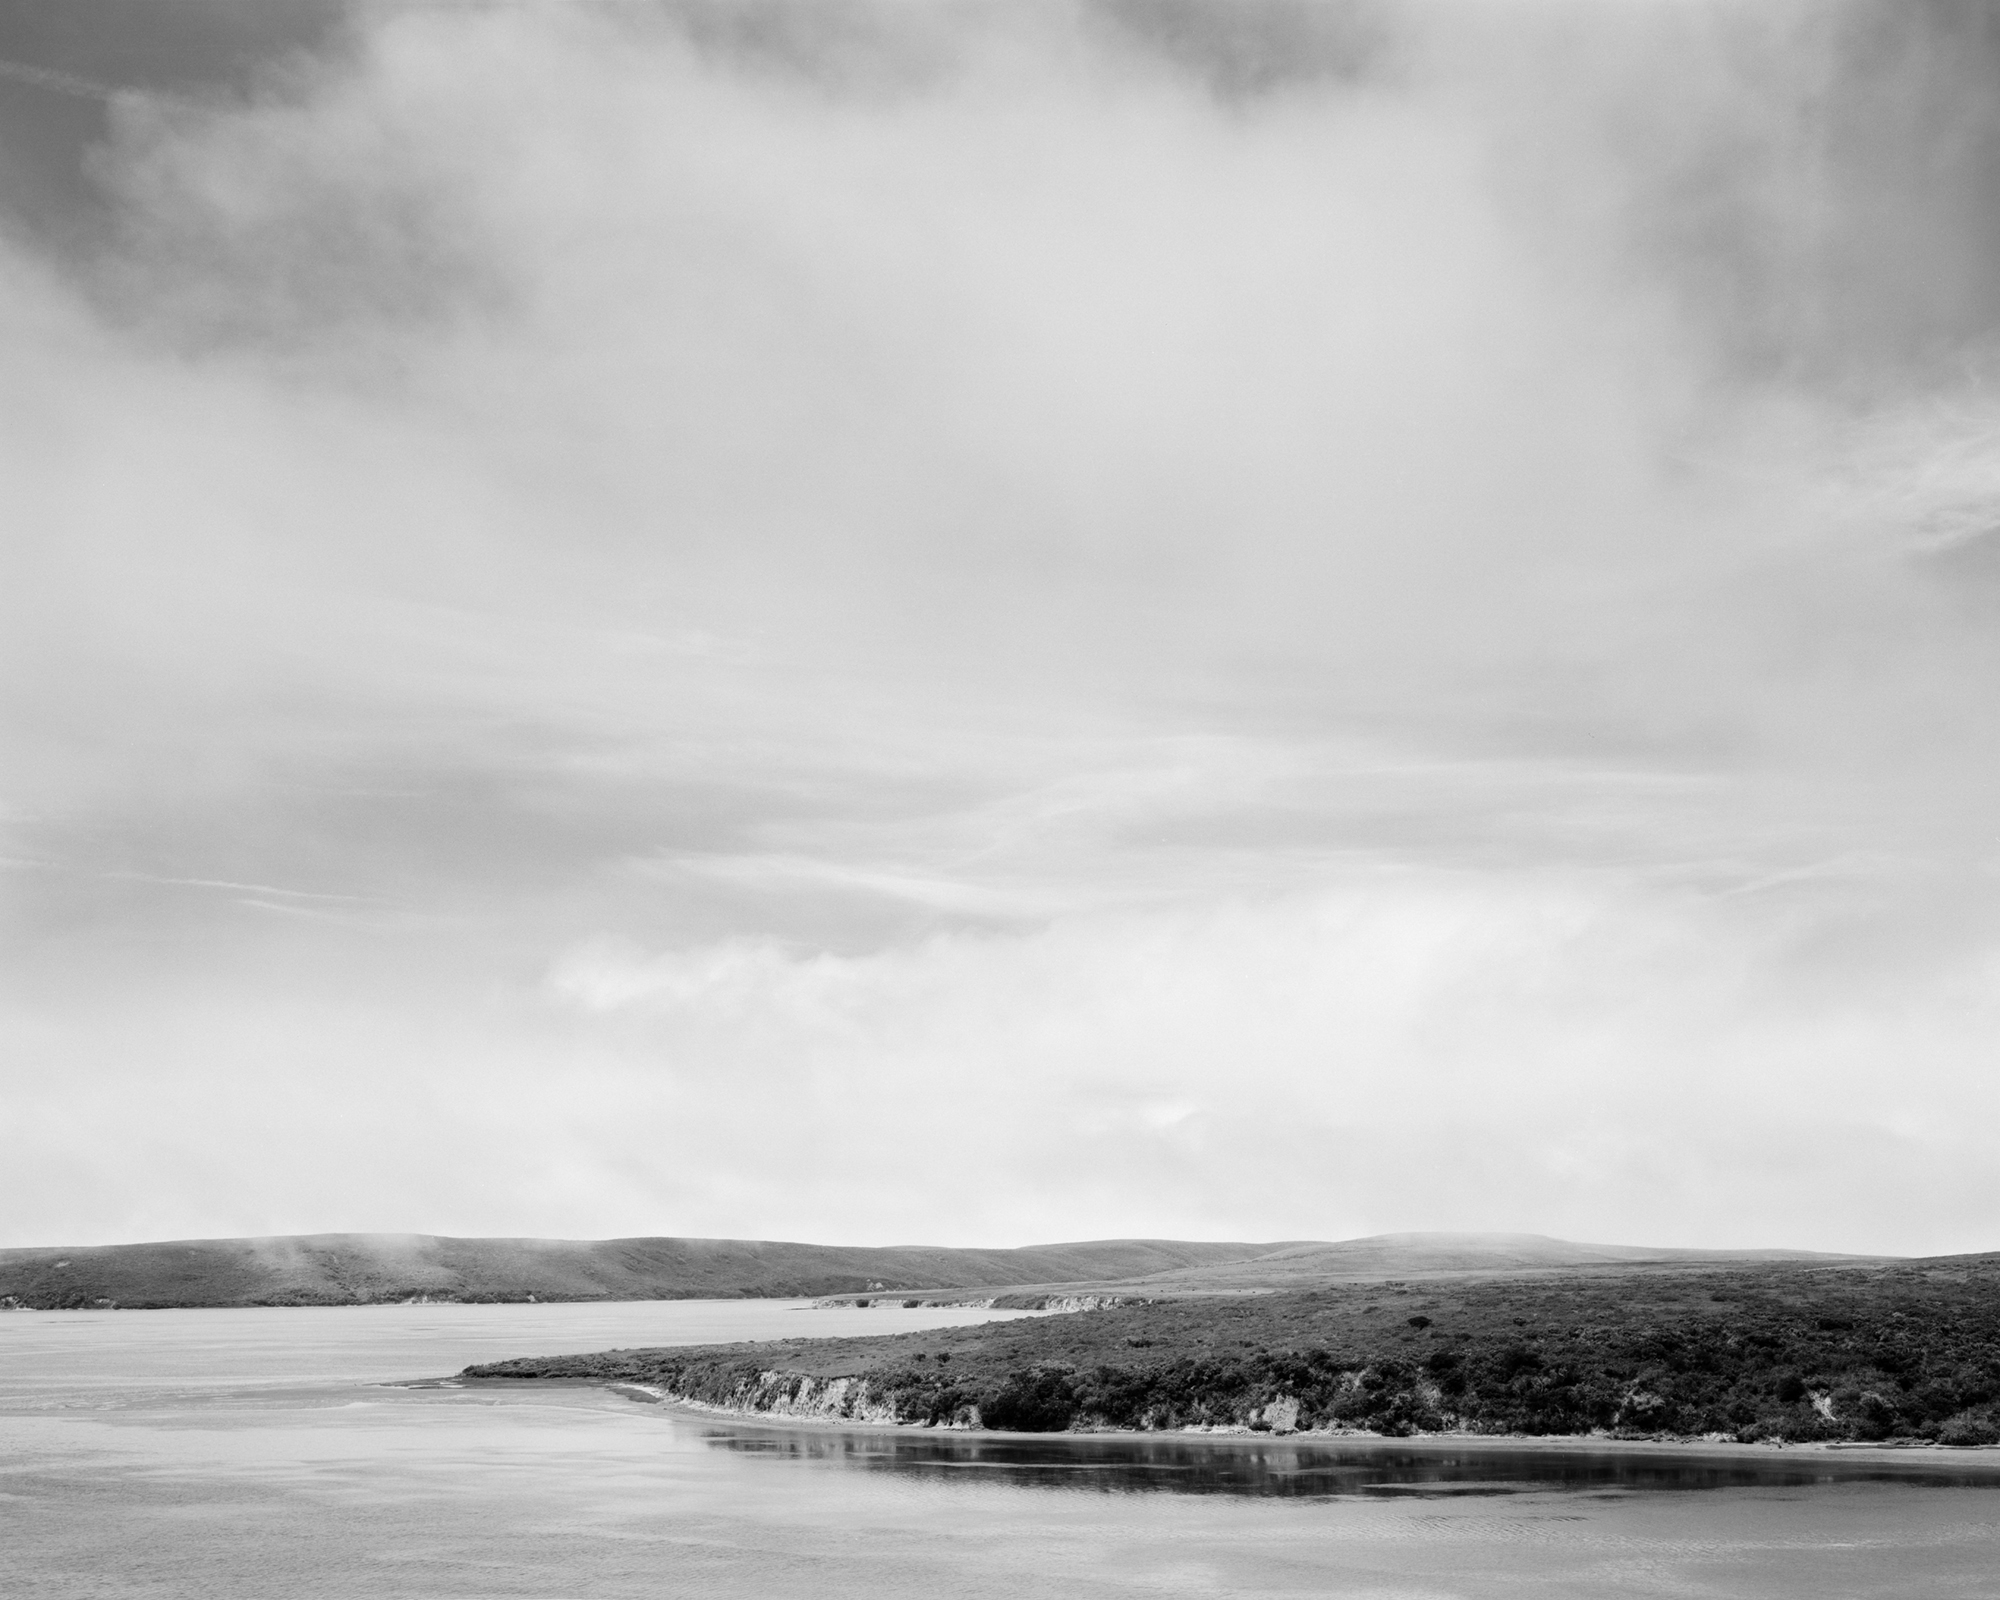 DRAKES ESTERO II, 2017. Point Reyes National Seashore, CA